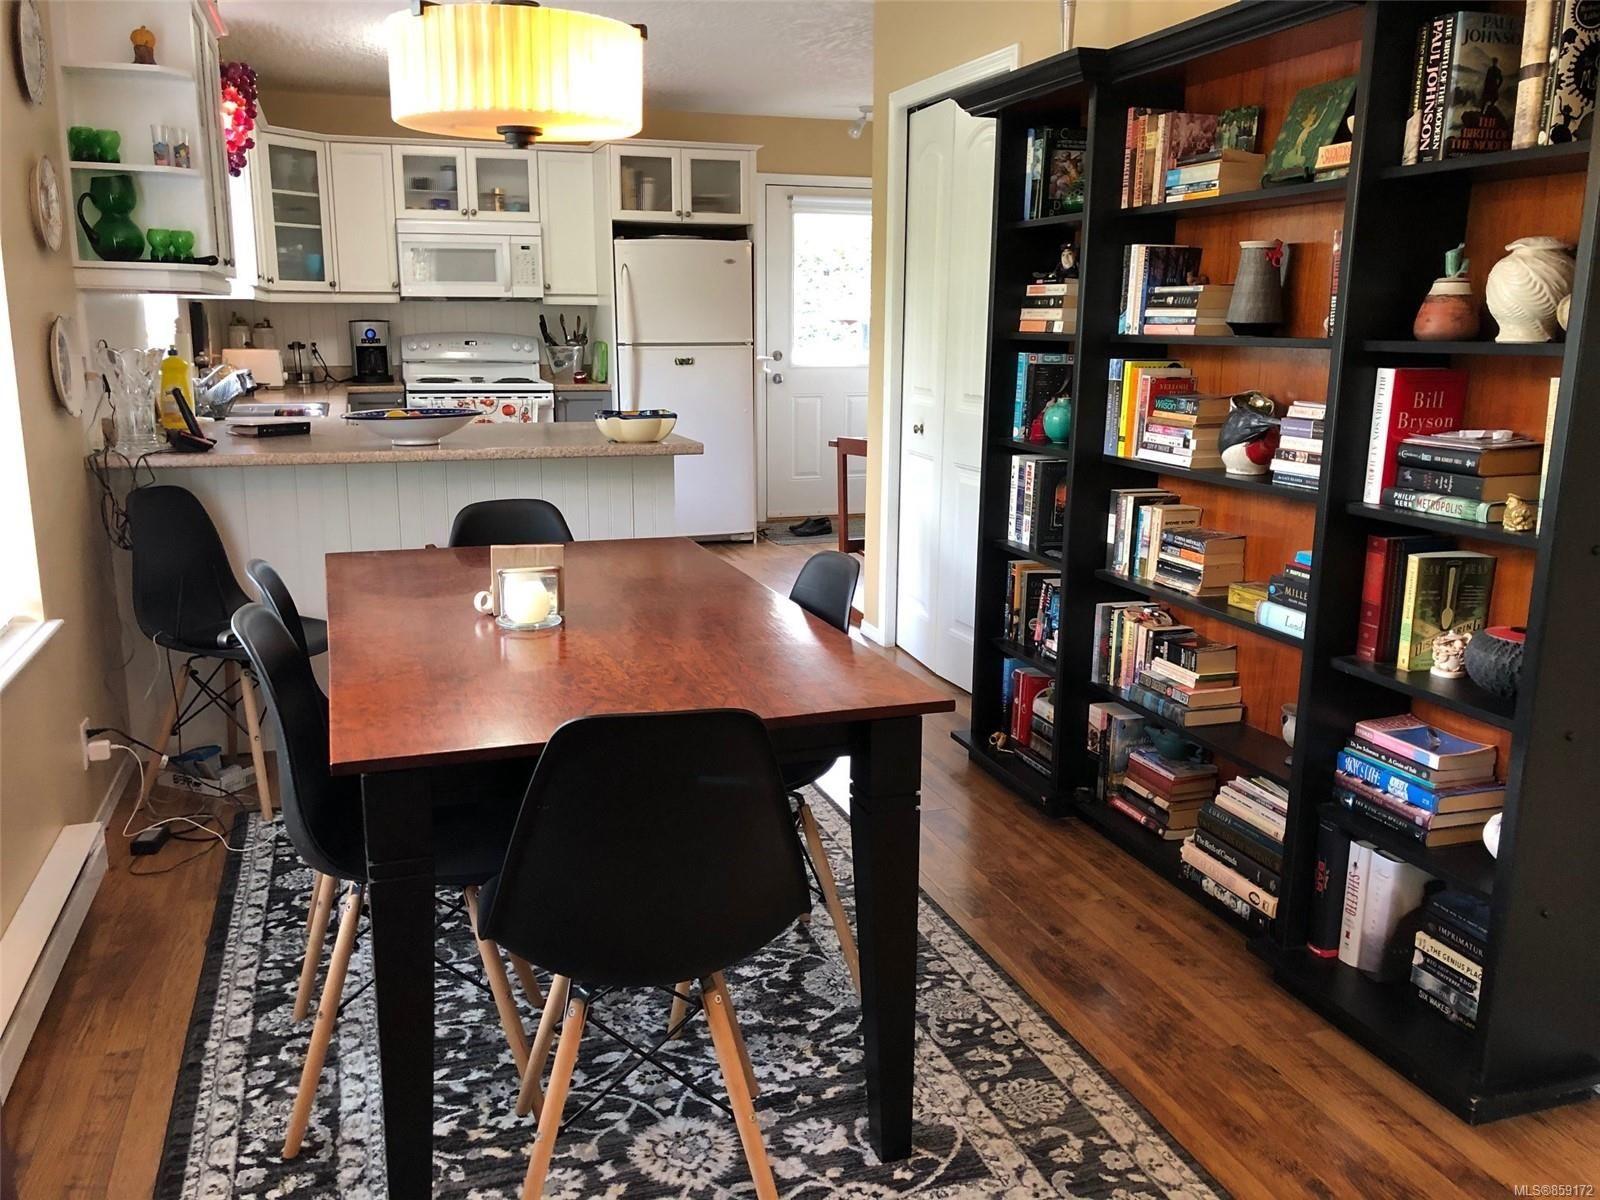 Photo 4: Photos: 1723 Karen's Crt in : PQ Qualicum North House for sale (Parksville/Qualicum)  : MLS®# 859172